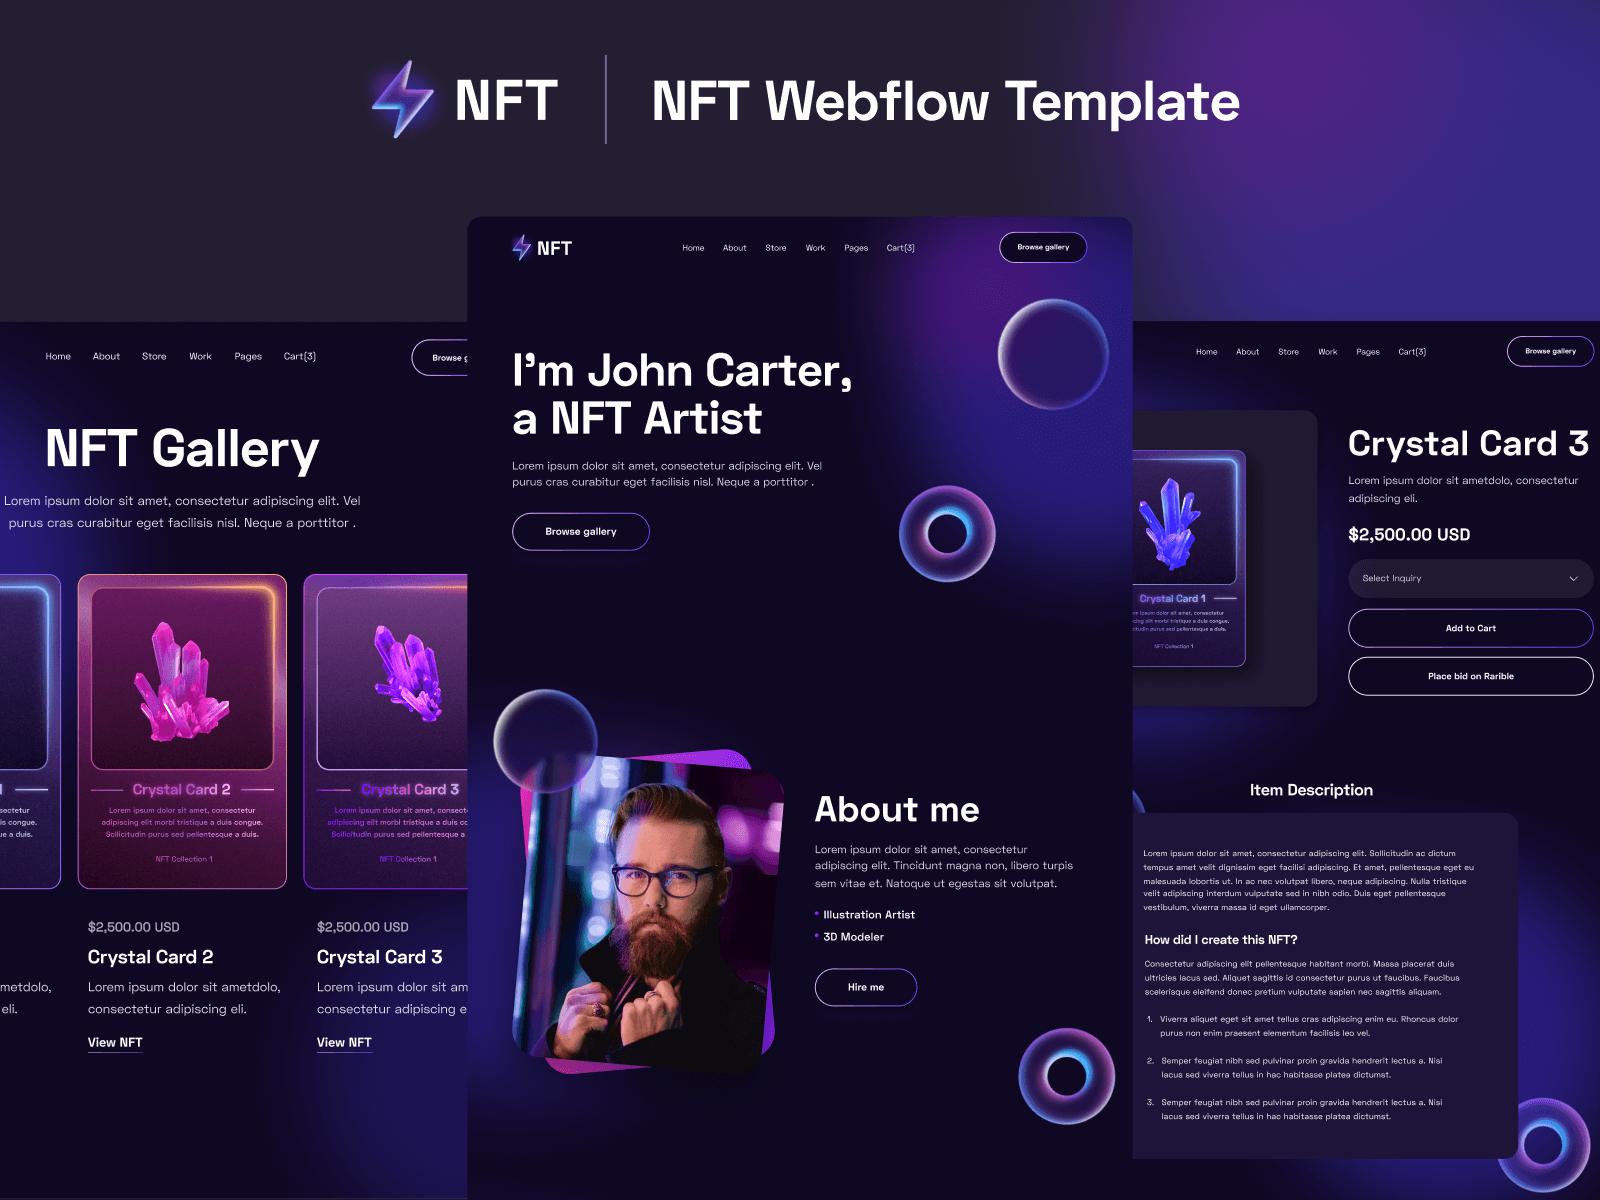 NFT Artist Webflow Template